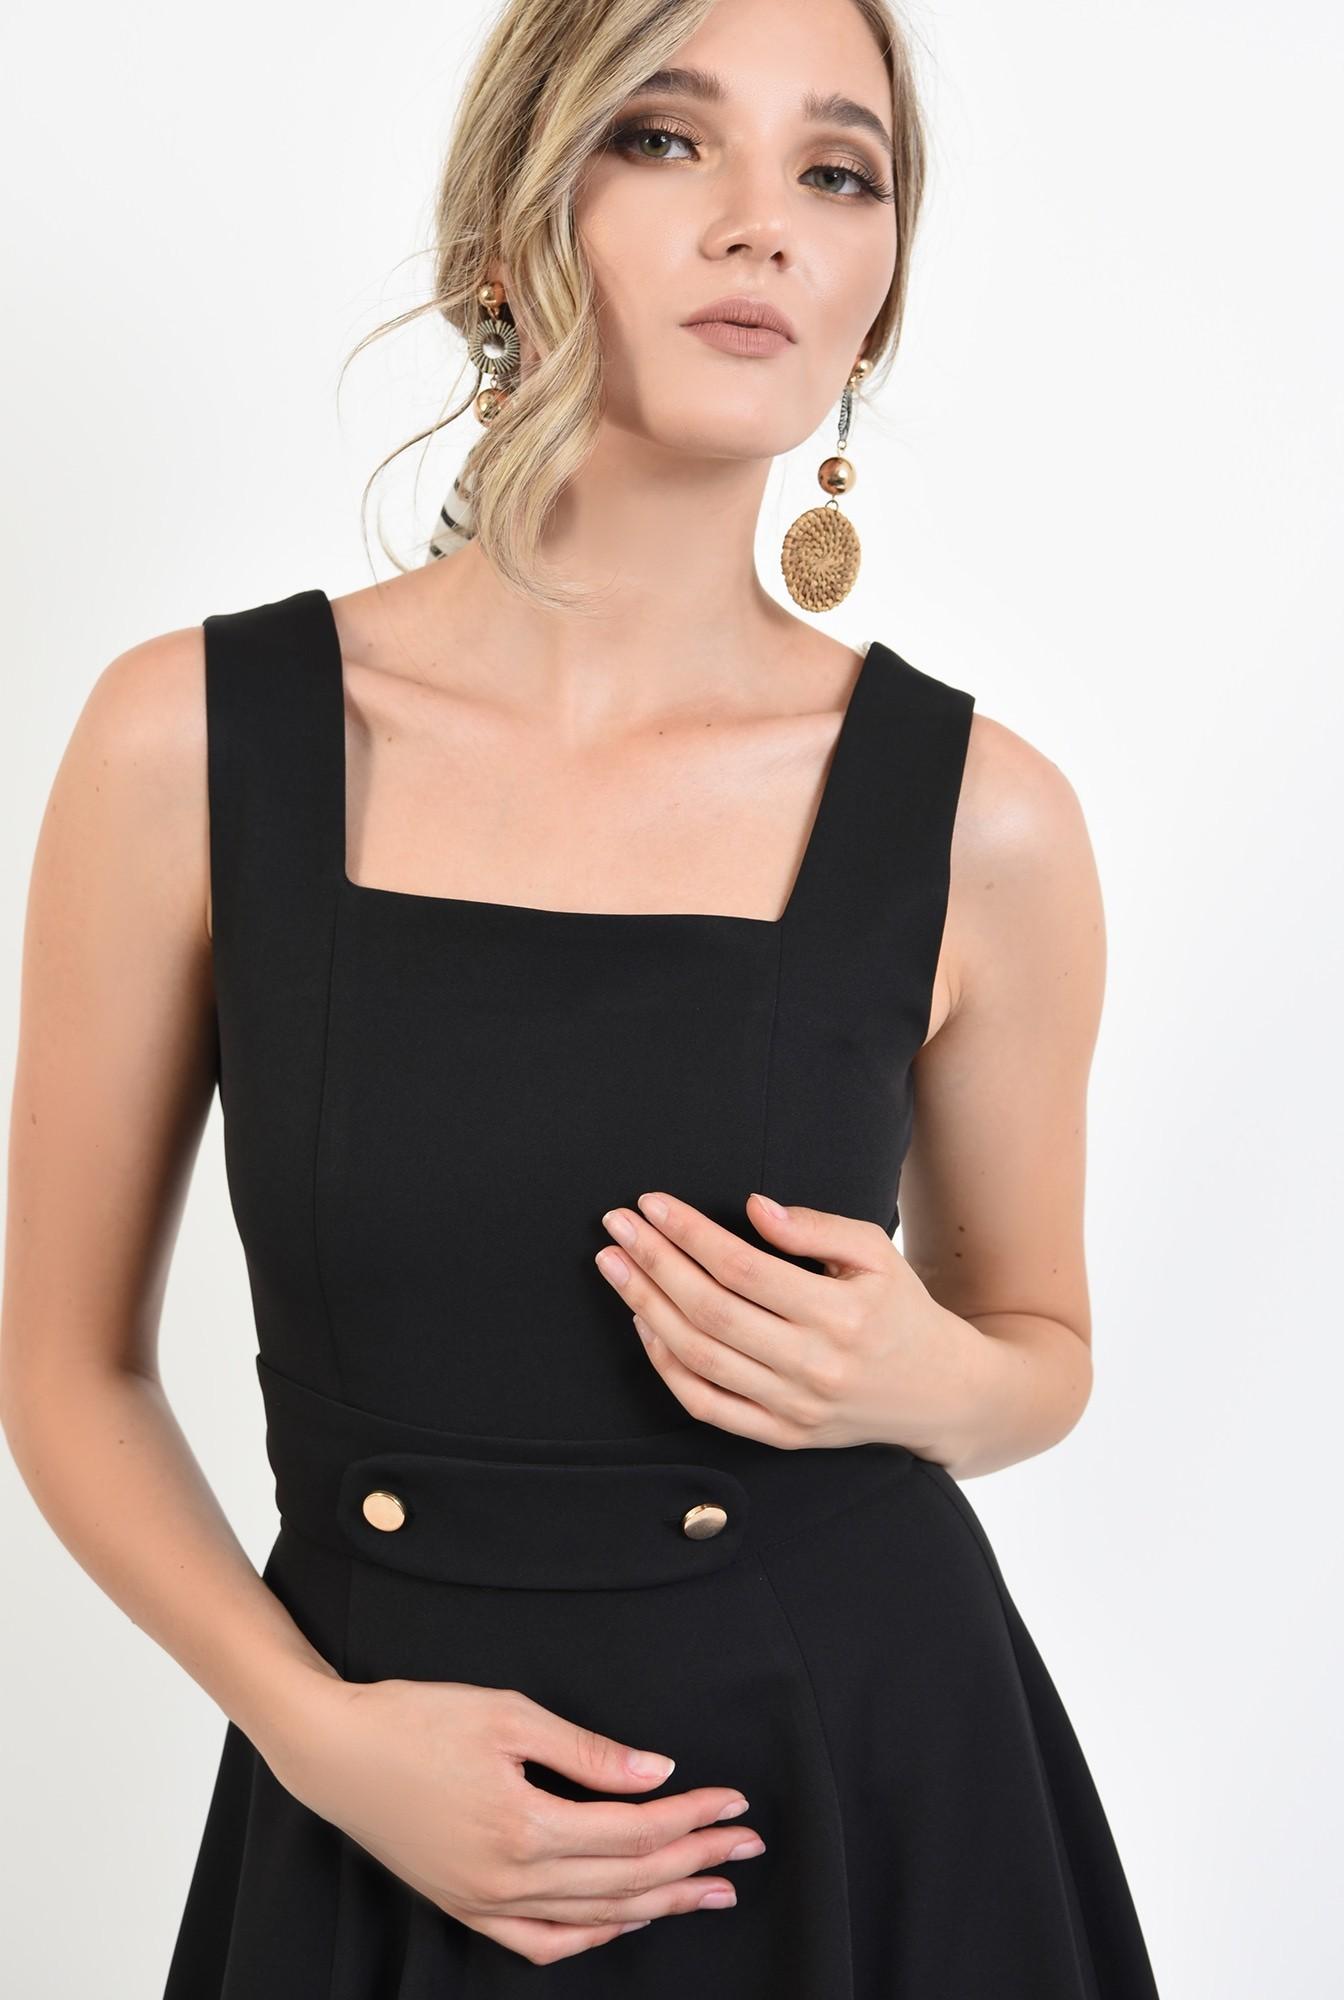 2 - 360 - rochie neagra, cu detaliu la talie, evazata, Poema